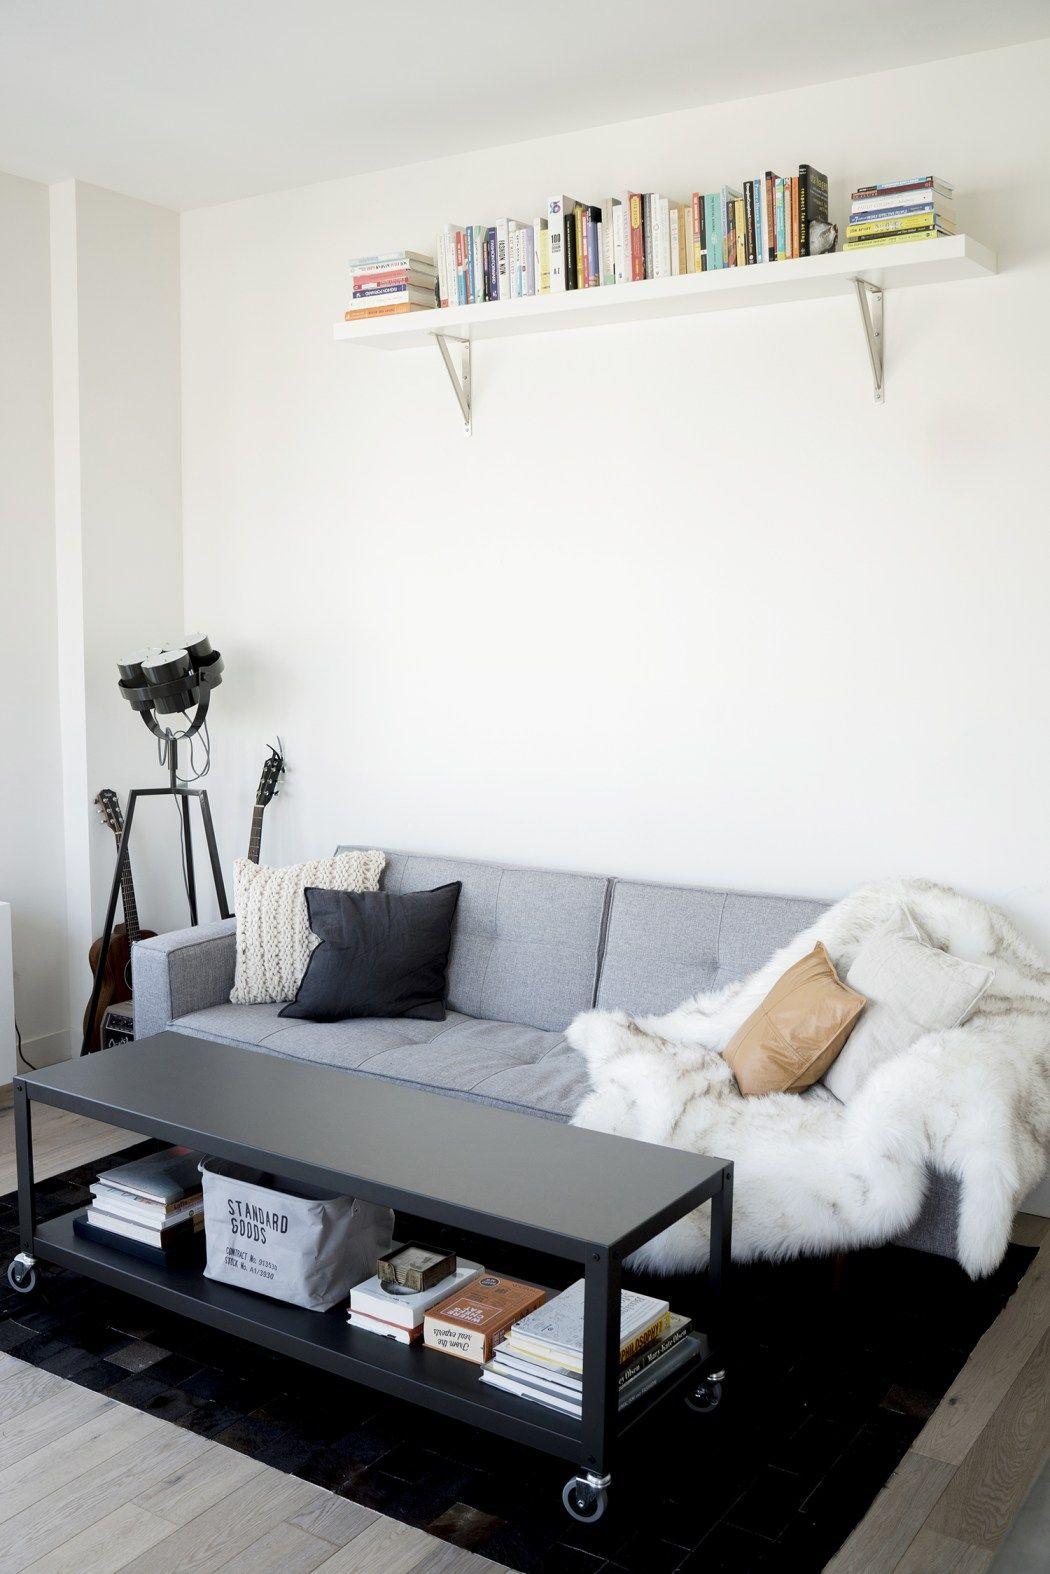 The NYC Apartment   Living room setup, Home decor, Nyc ...